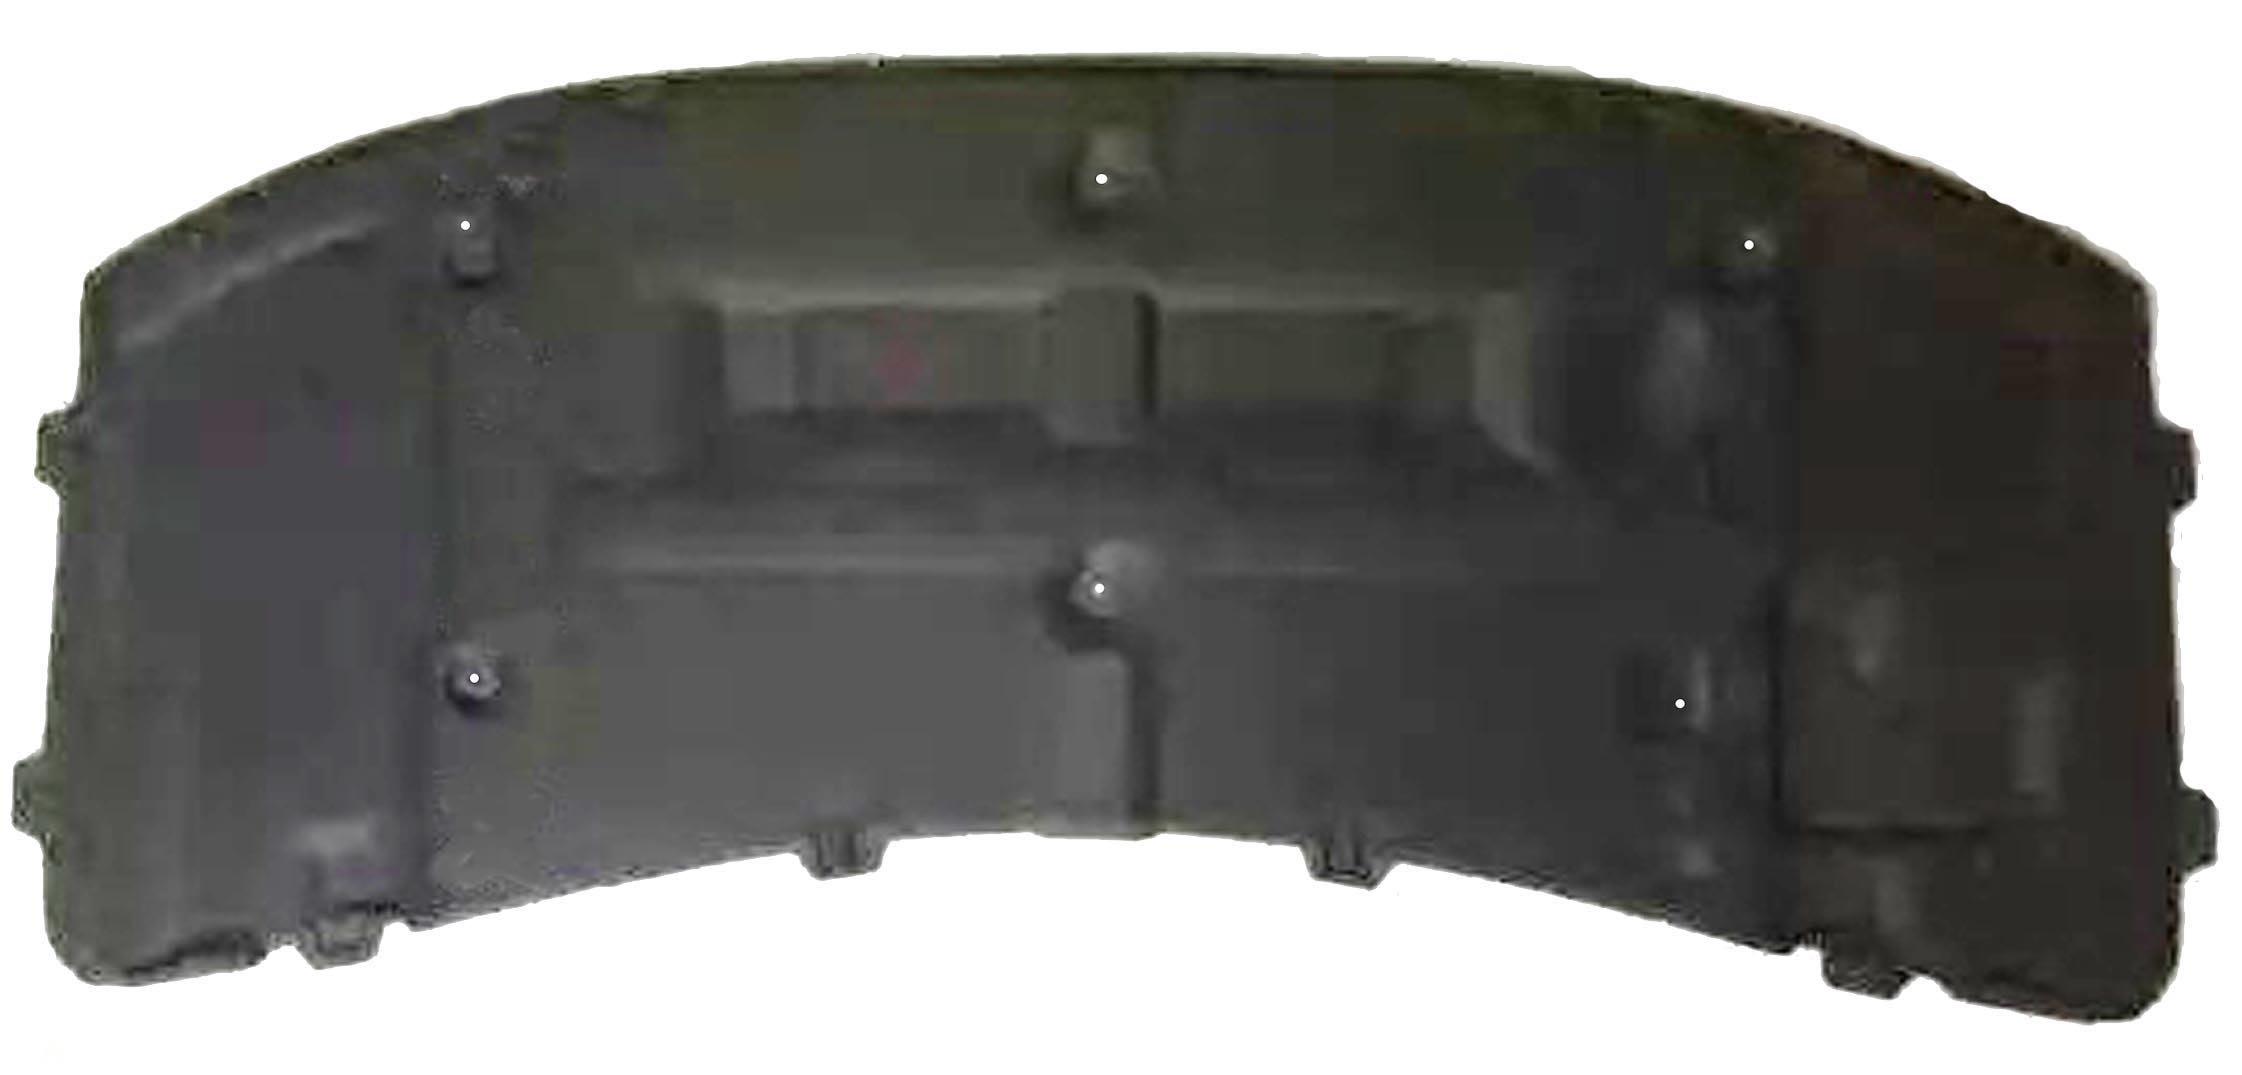 RANGE ROVER L322 (02~12) 引擎室隔熱棉